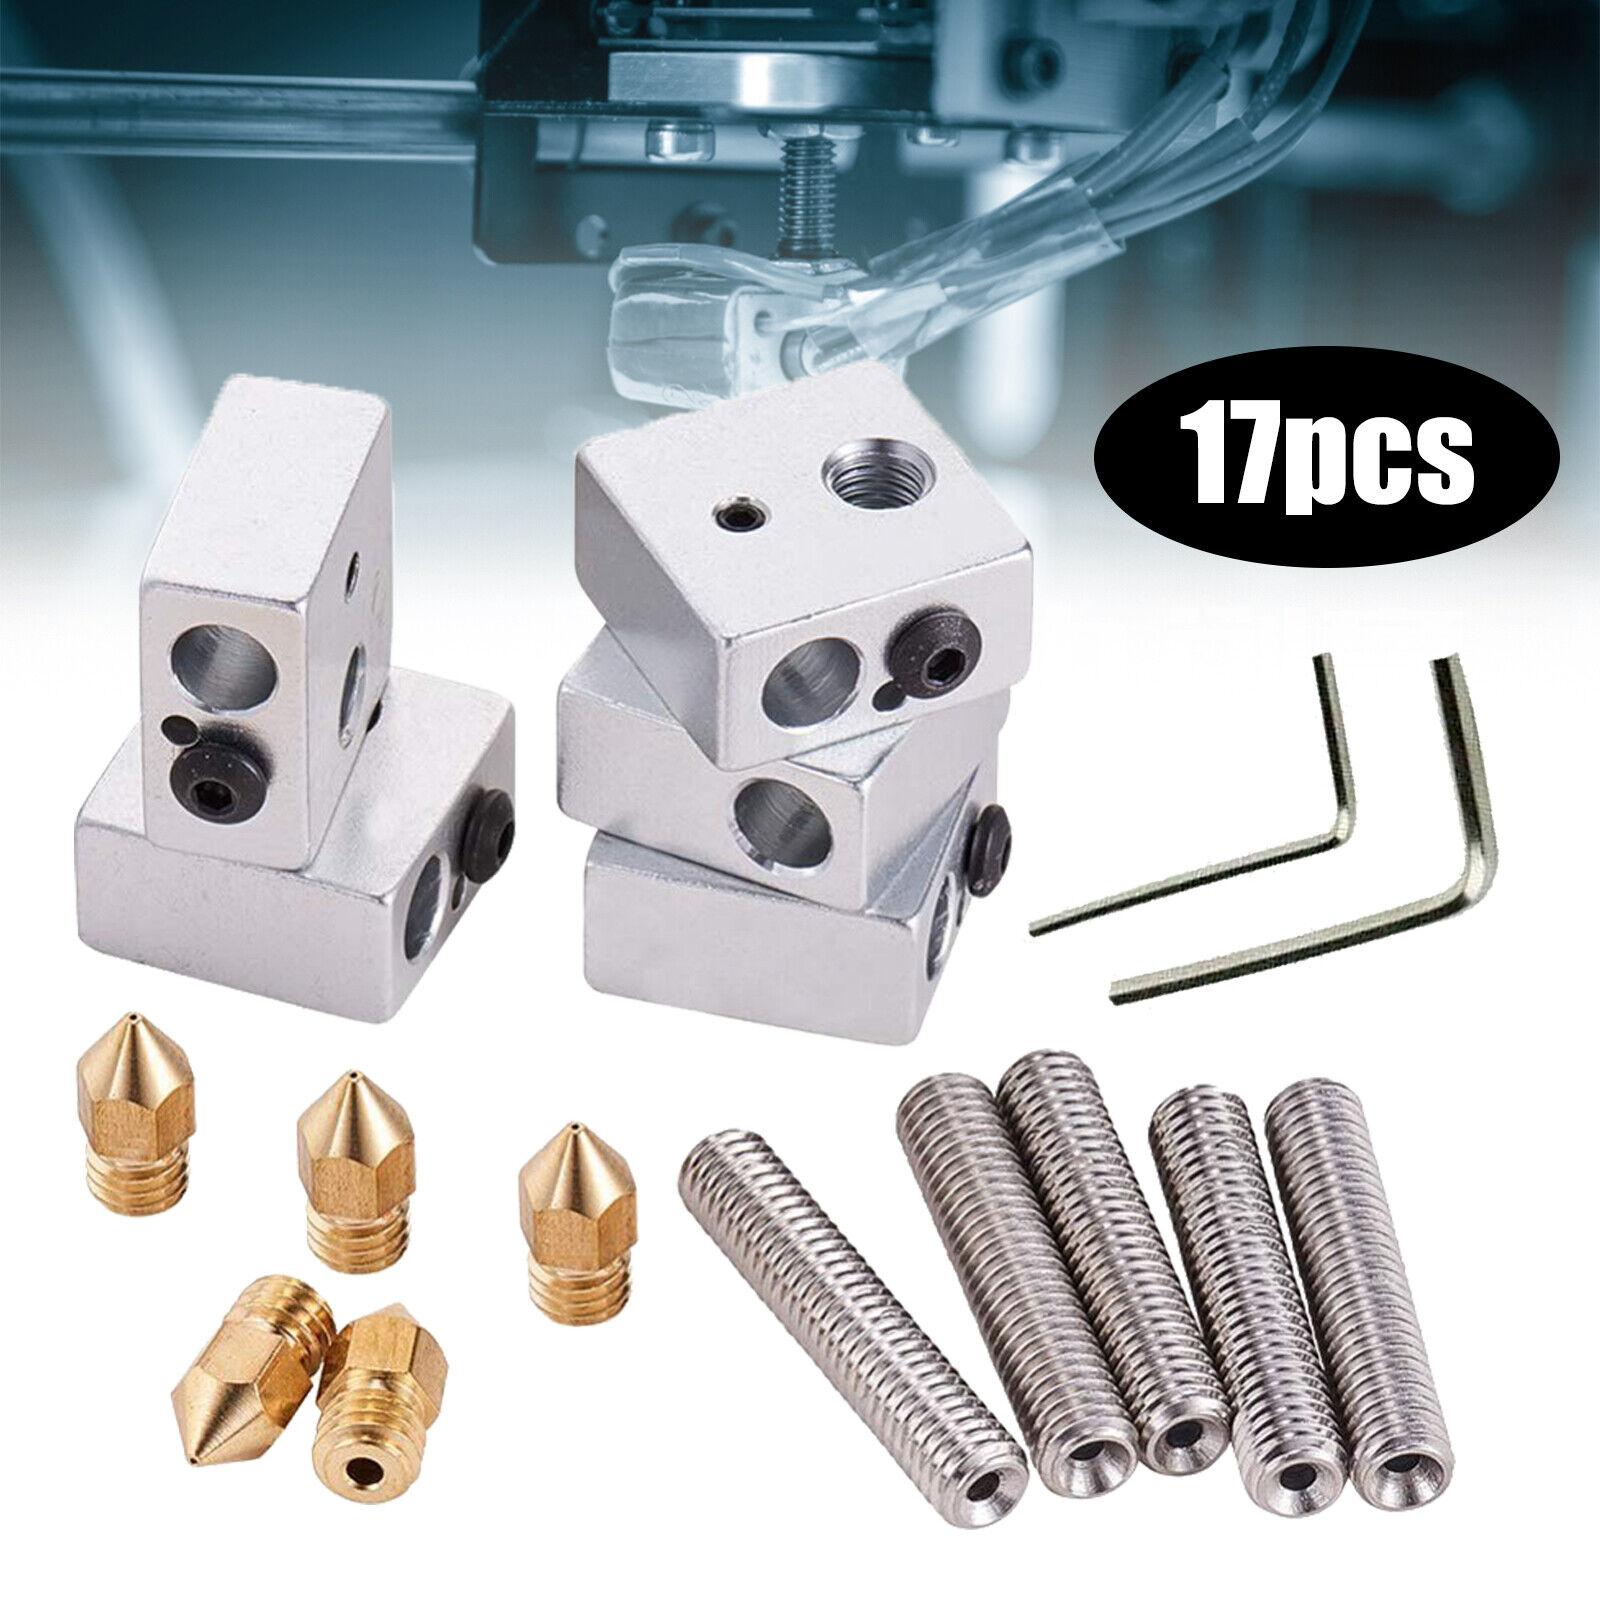 17PCS 3D Printer Nozzles Extruder Throat Tube Heating Blocks Hotend Anet MK8 Set